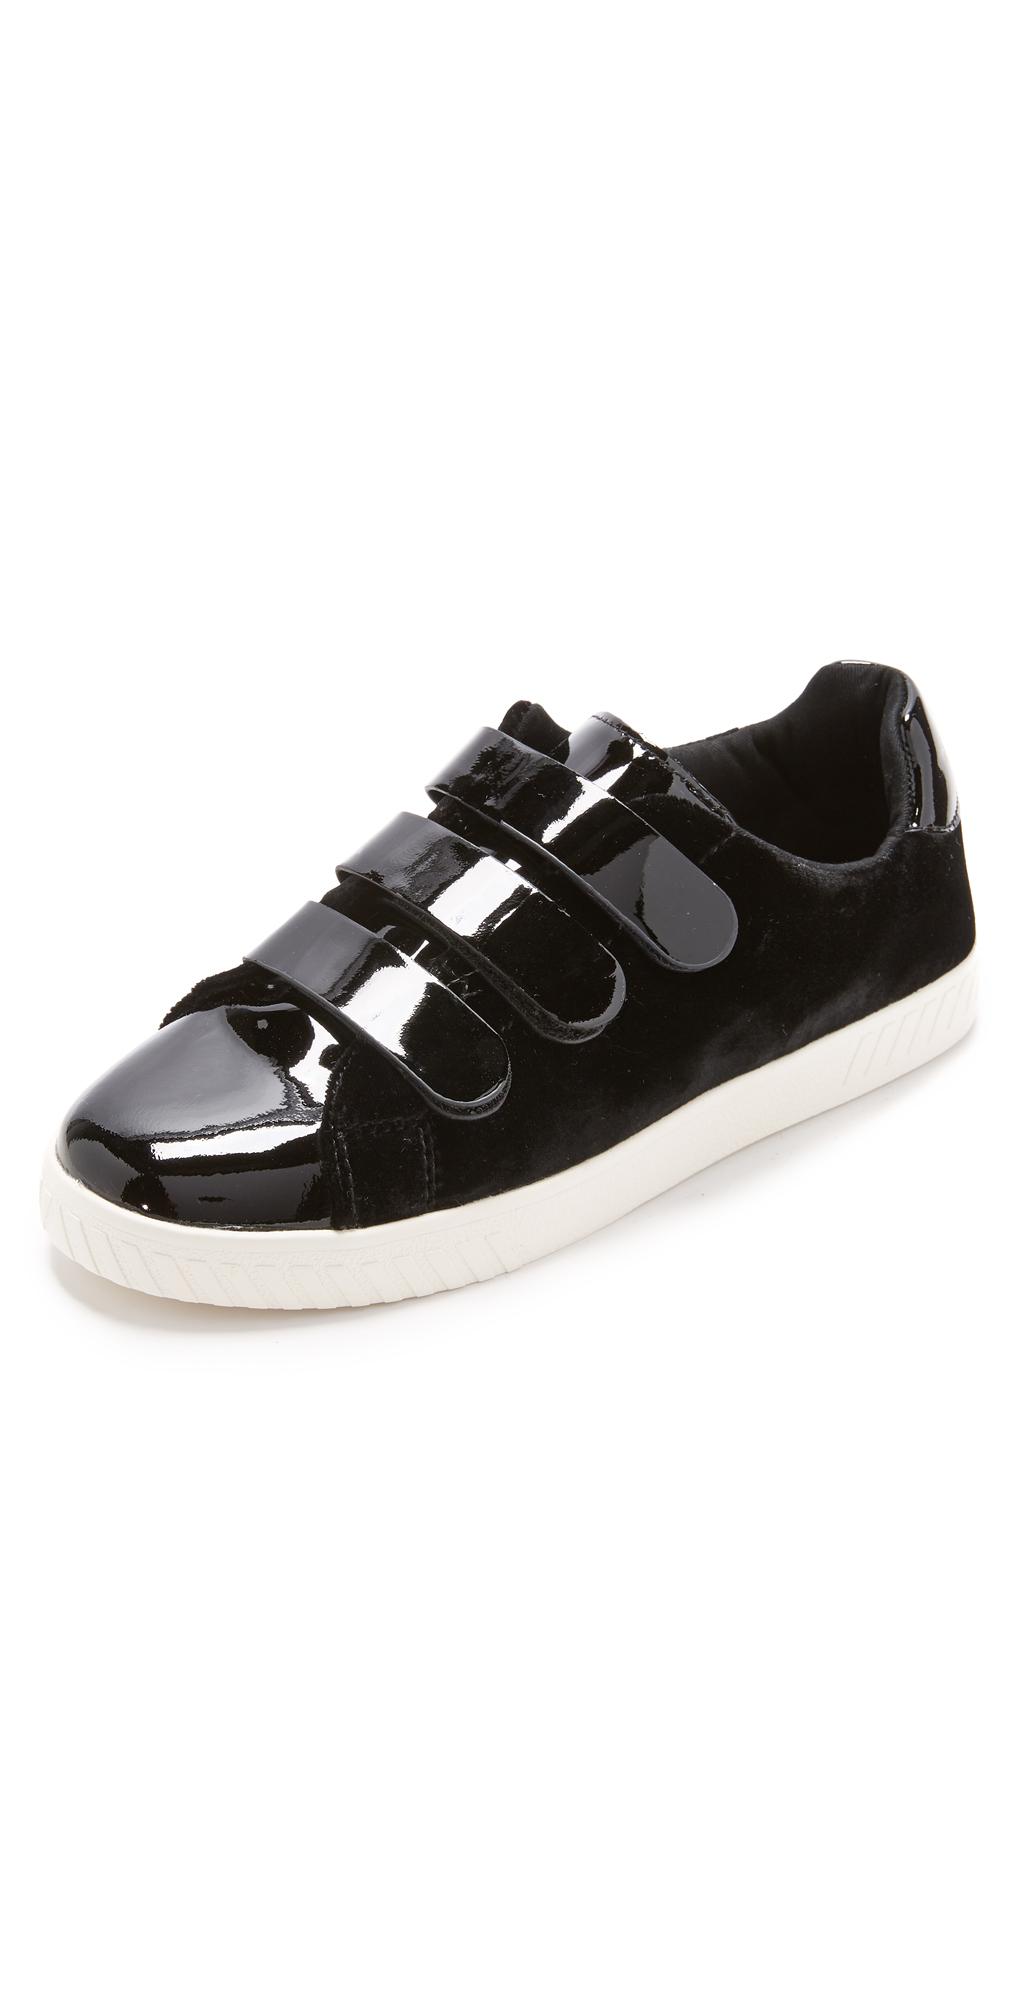 Carry IV Velcro Sneakers Tretorn